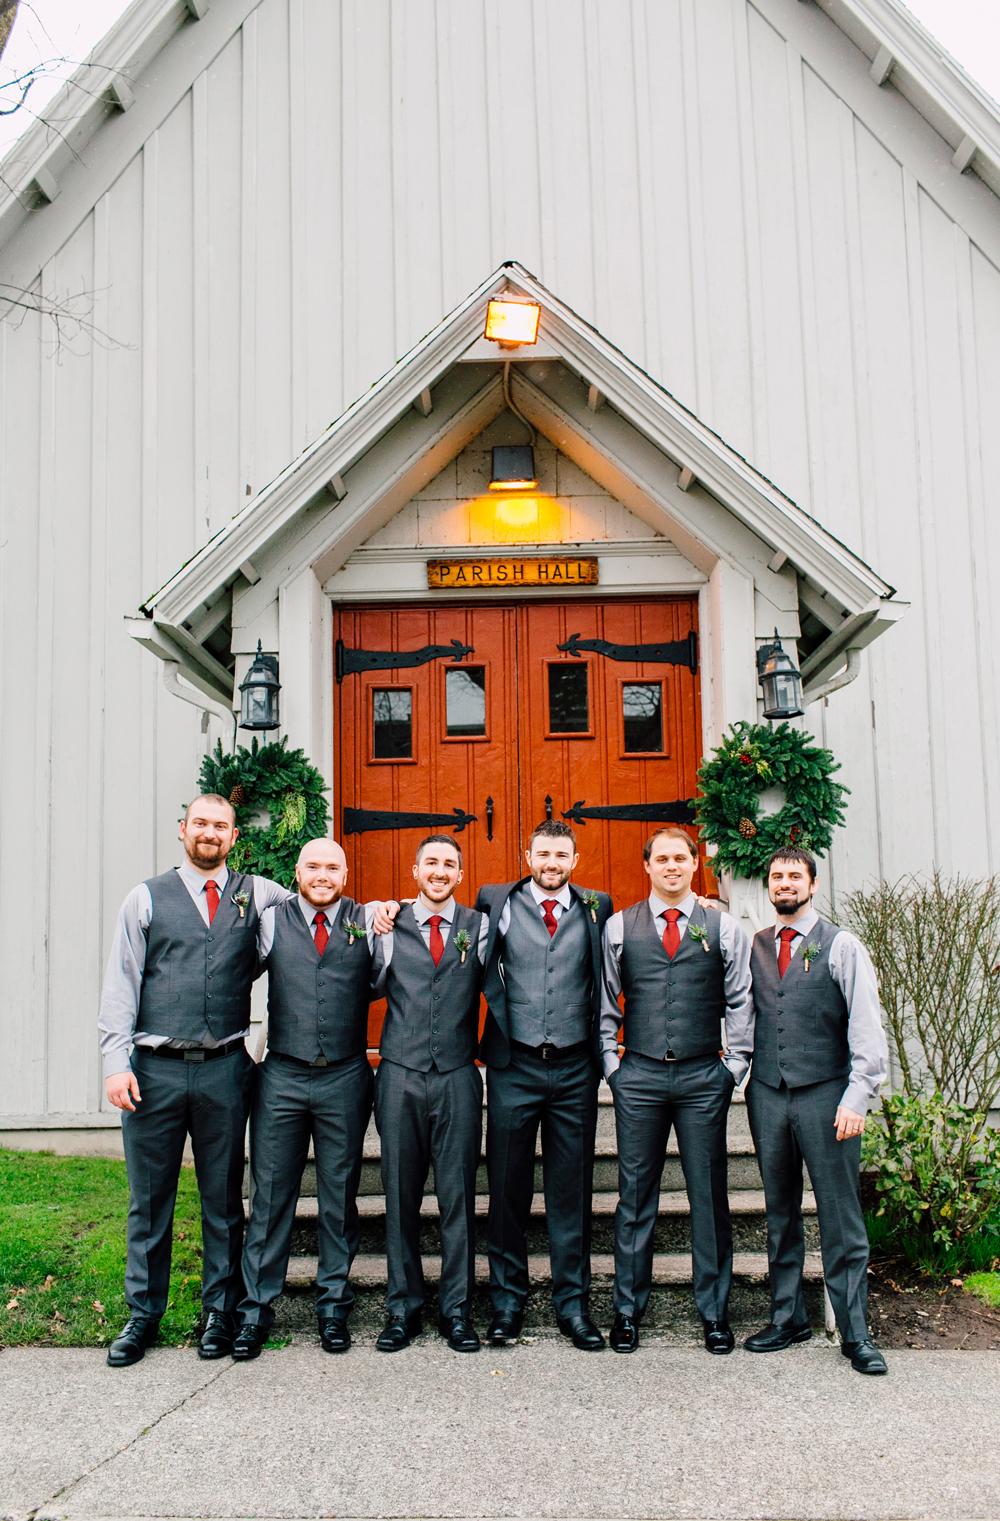 035-bellingham-wedding-photographer-broadway-hall-katheryn-moran-jessie-kyle.jpg